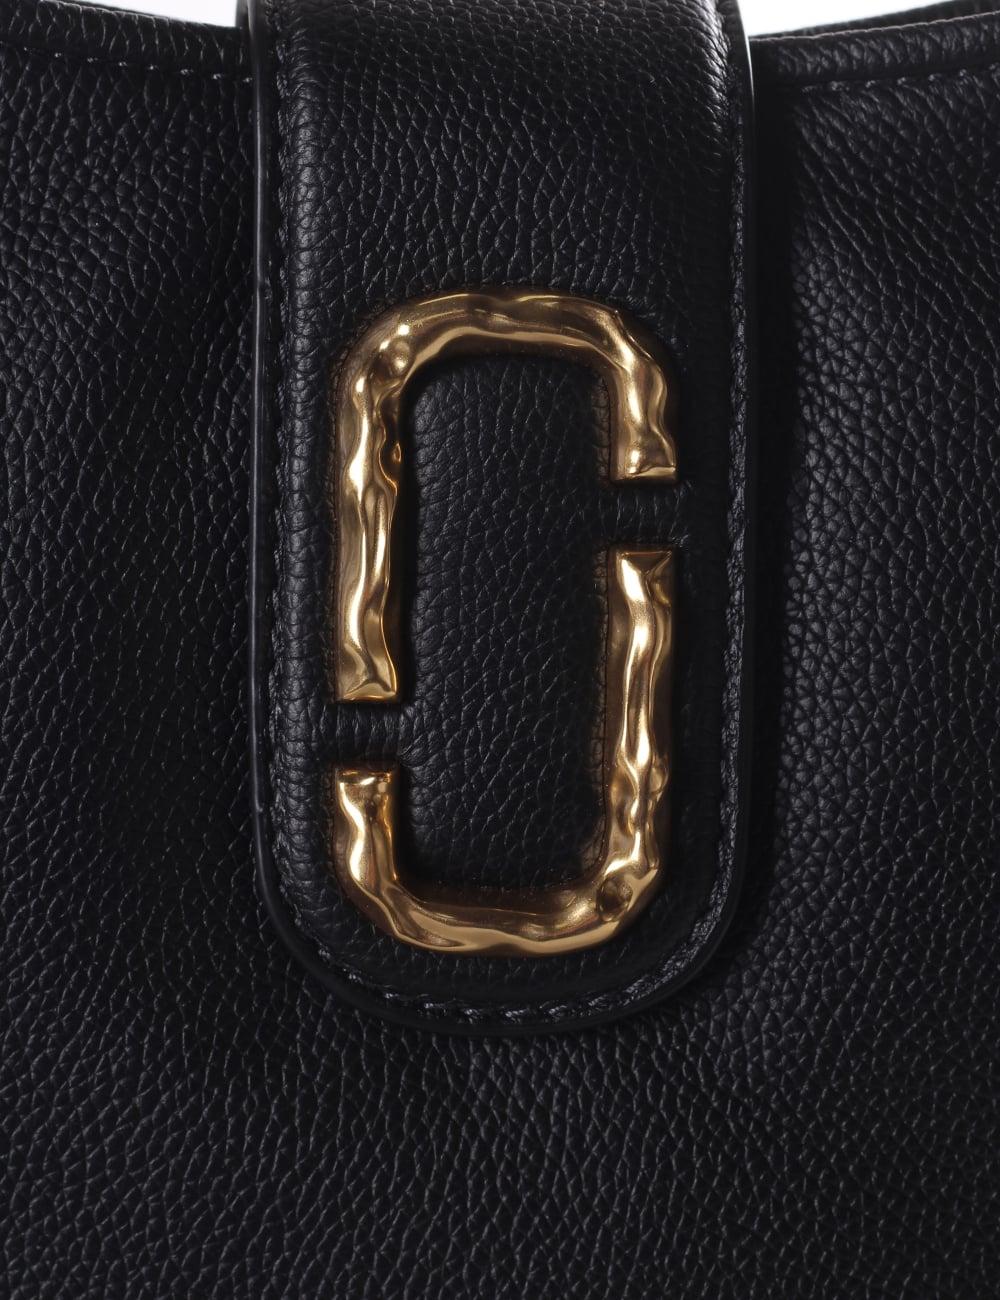 Marc Jacobs Interlock Women s Small Hobo Bag d9098ef389a9c